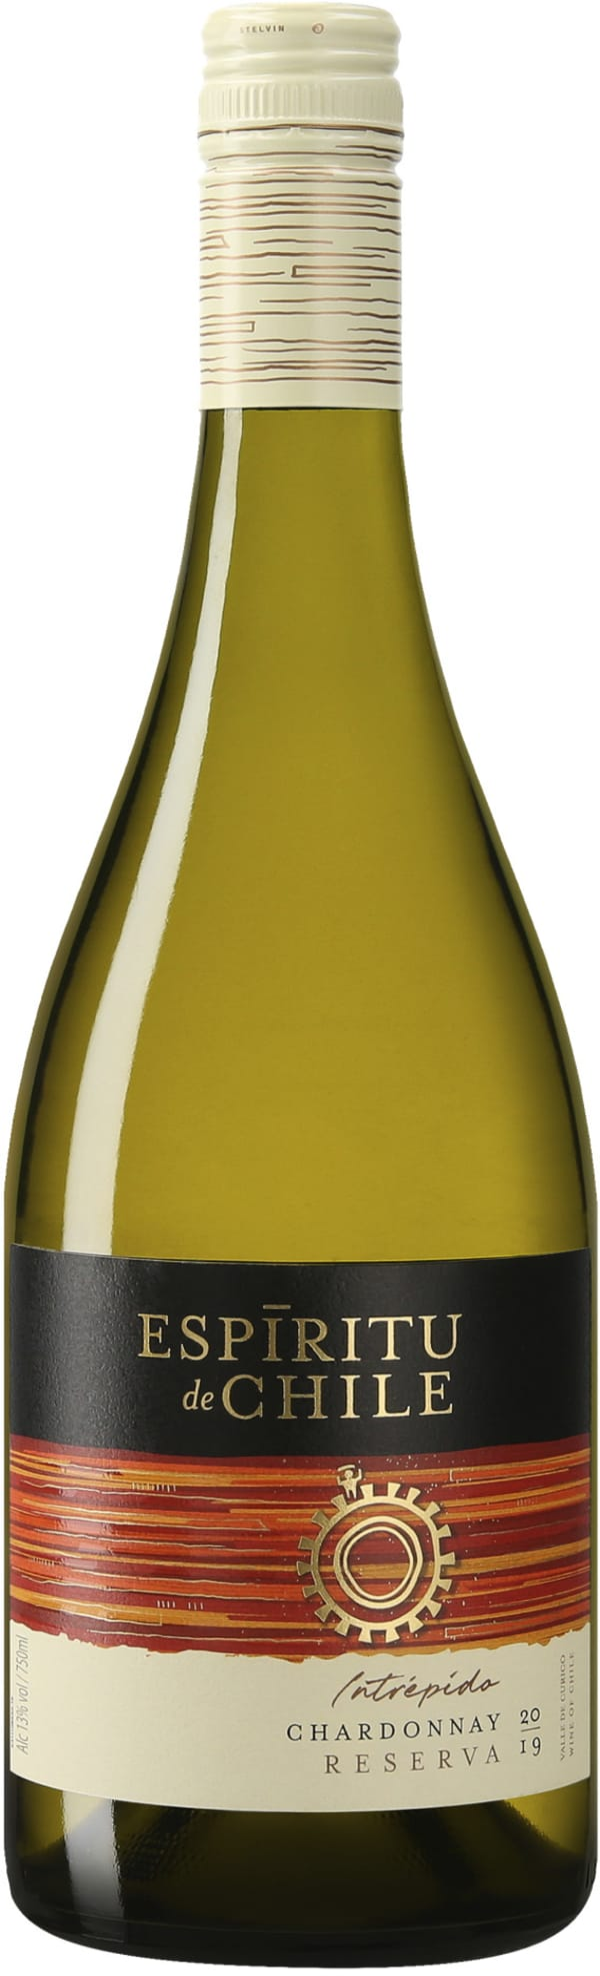 Espíritu de Chile Reserva Chardonnay 2017